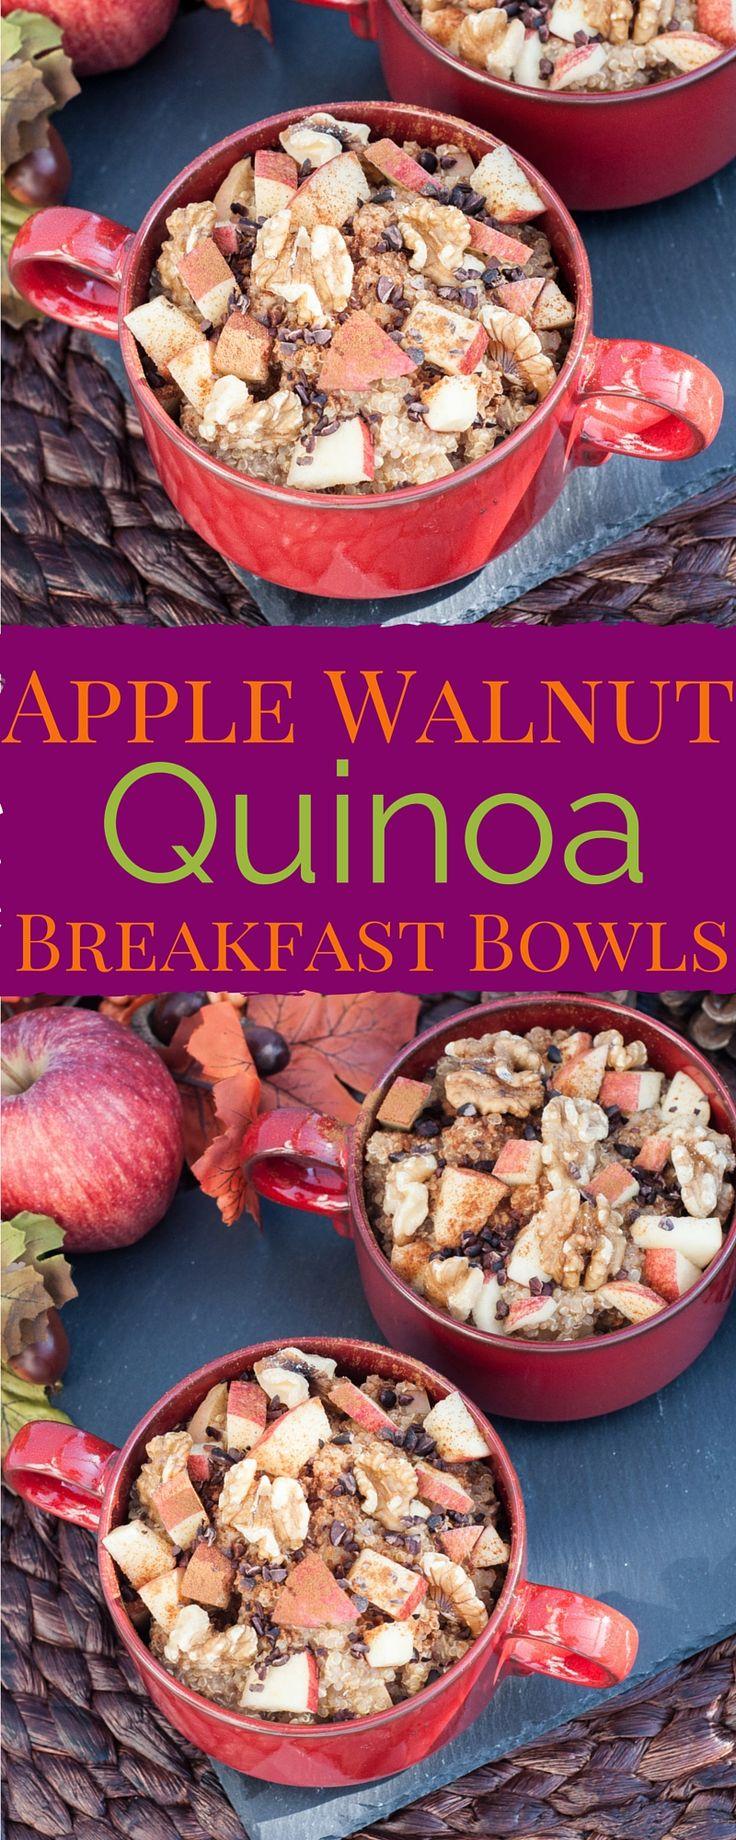 Apple Walnut Quinoa Breakfast Bowls Recipe | VeganFamilyRecipes.com | #vegan #gf #glutenfree #healthy #low cal #clean eating #am #fall #thanksgiving